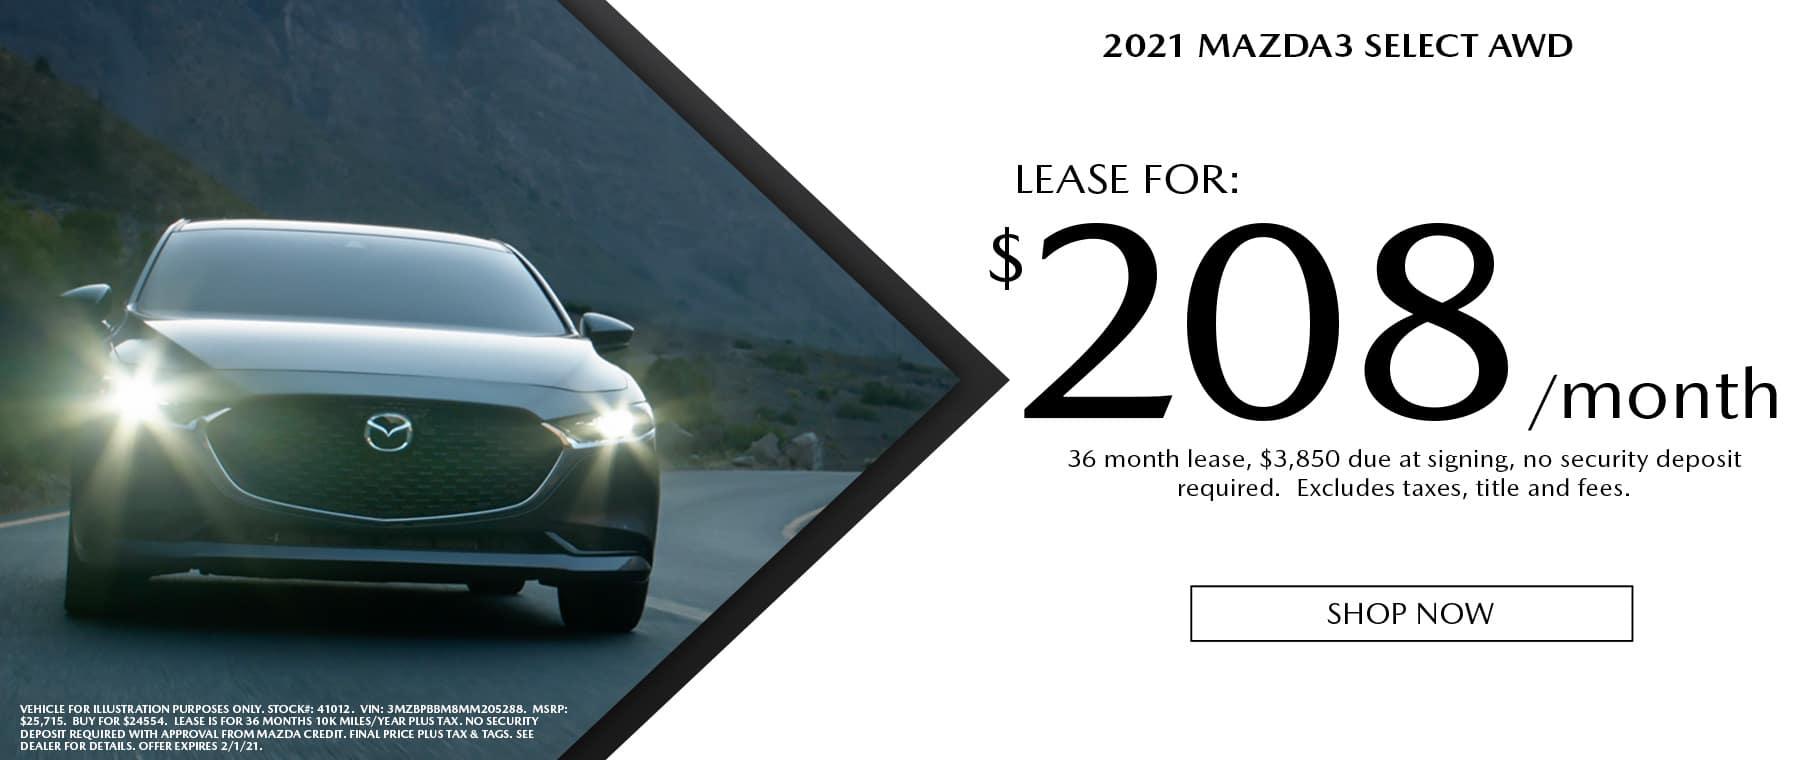 1_21_WV_Mazda_Web_Banners-2021-Mazda3